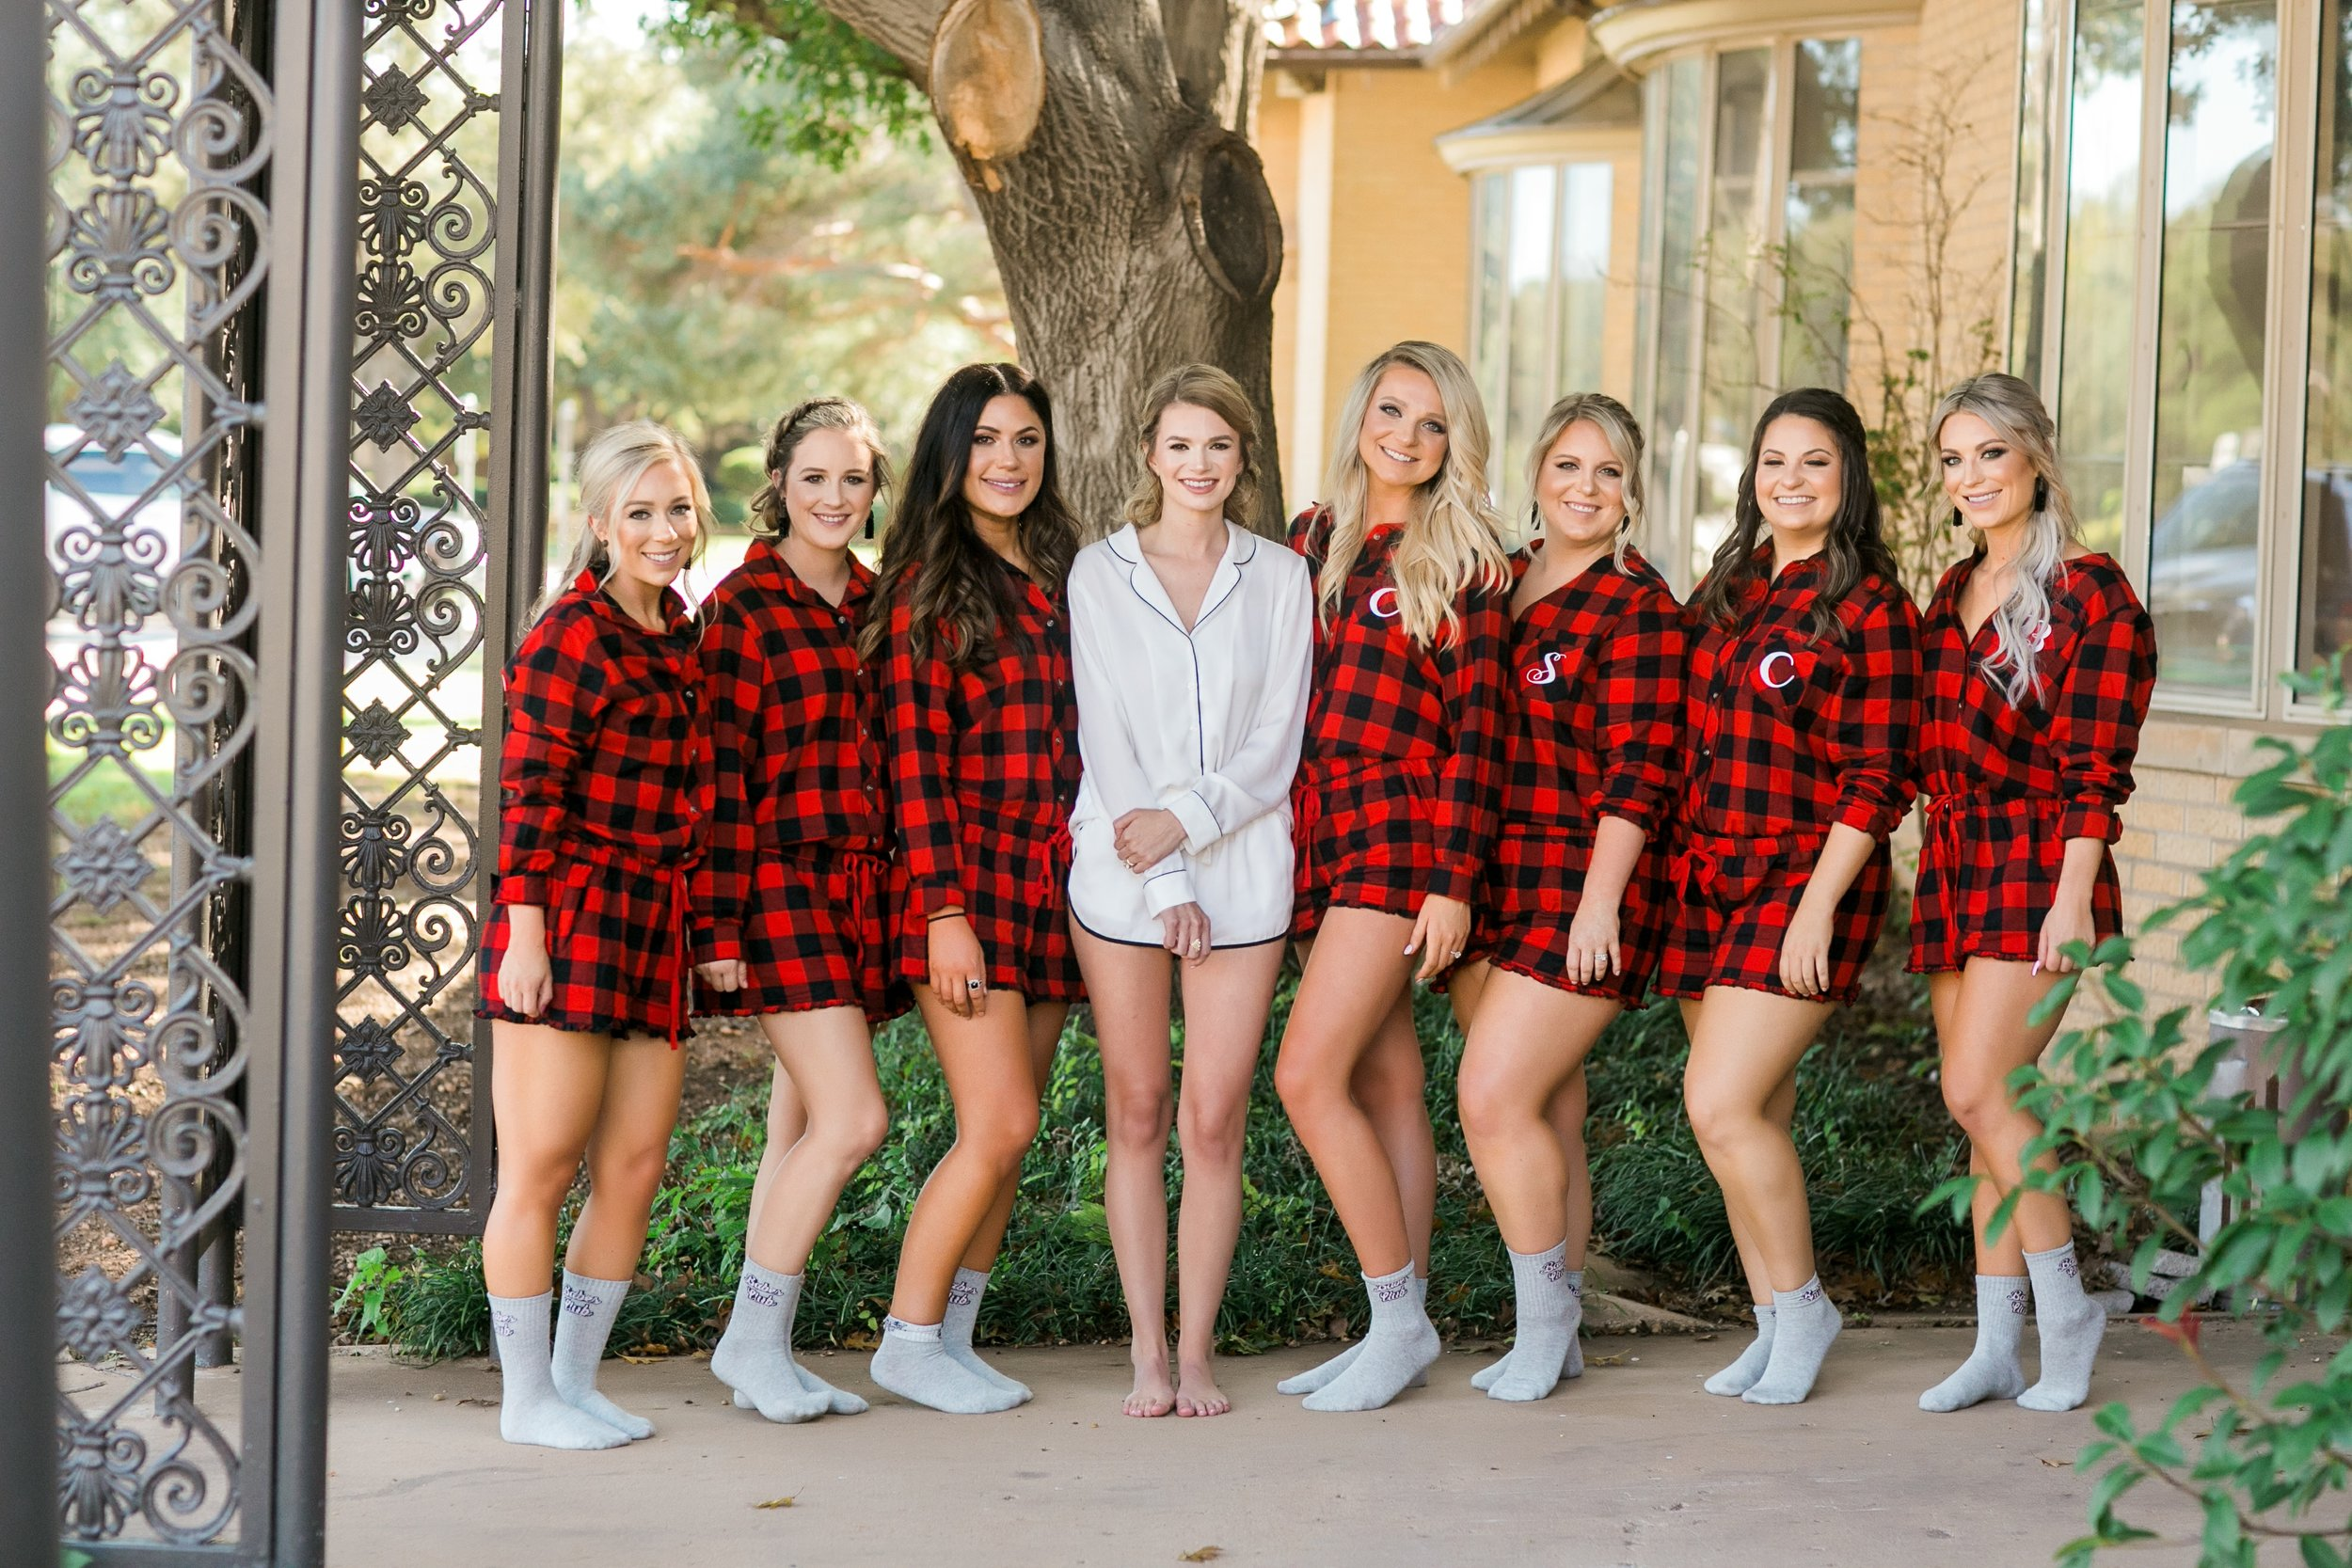 Roberson-Wedding-The-Forum-Lauren-Pinson-Wedding-Photography-Wichita-Falls-Texas-004.jpg